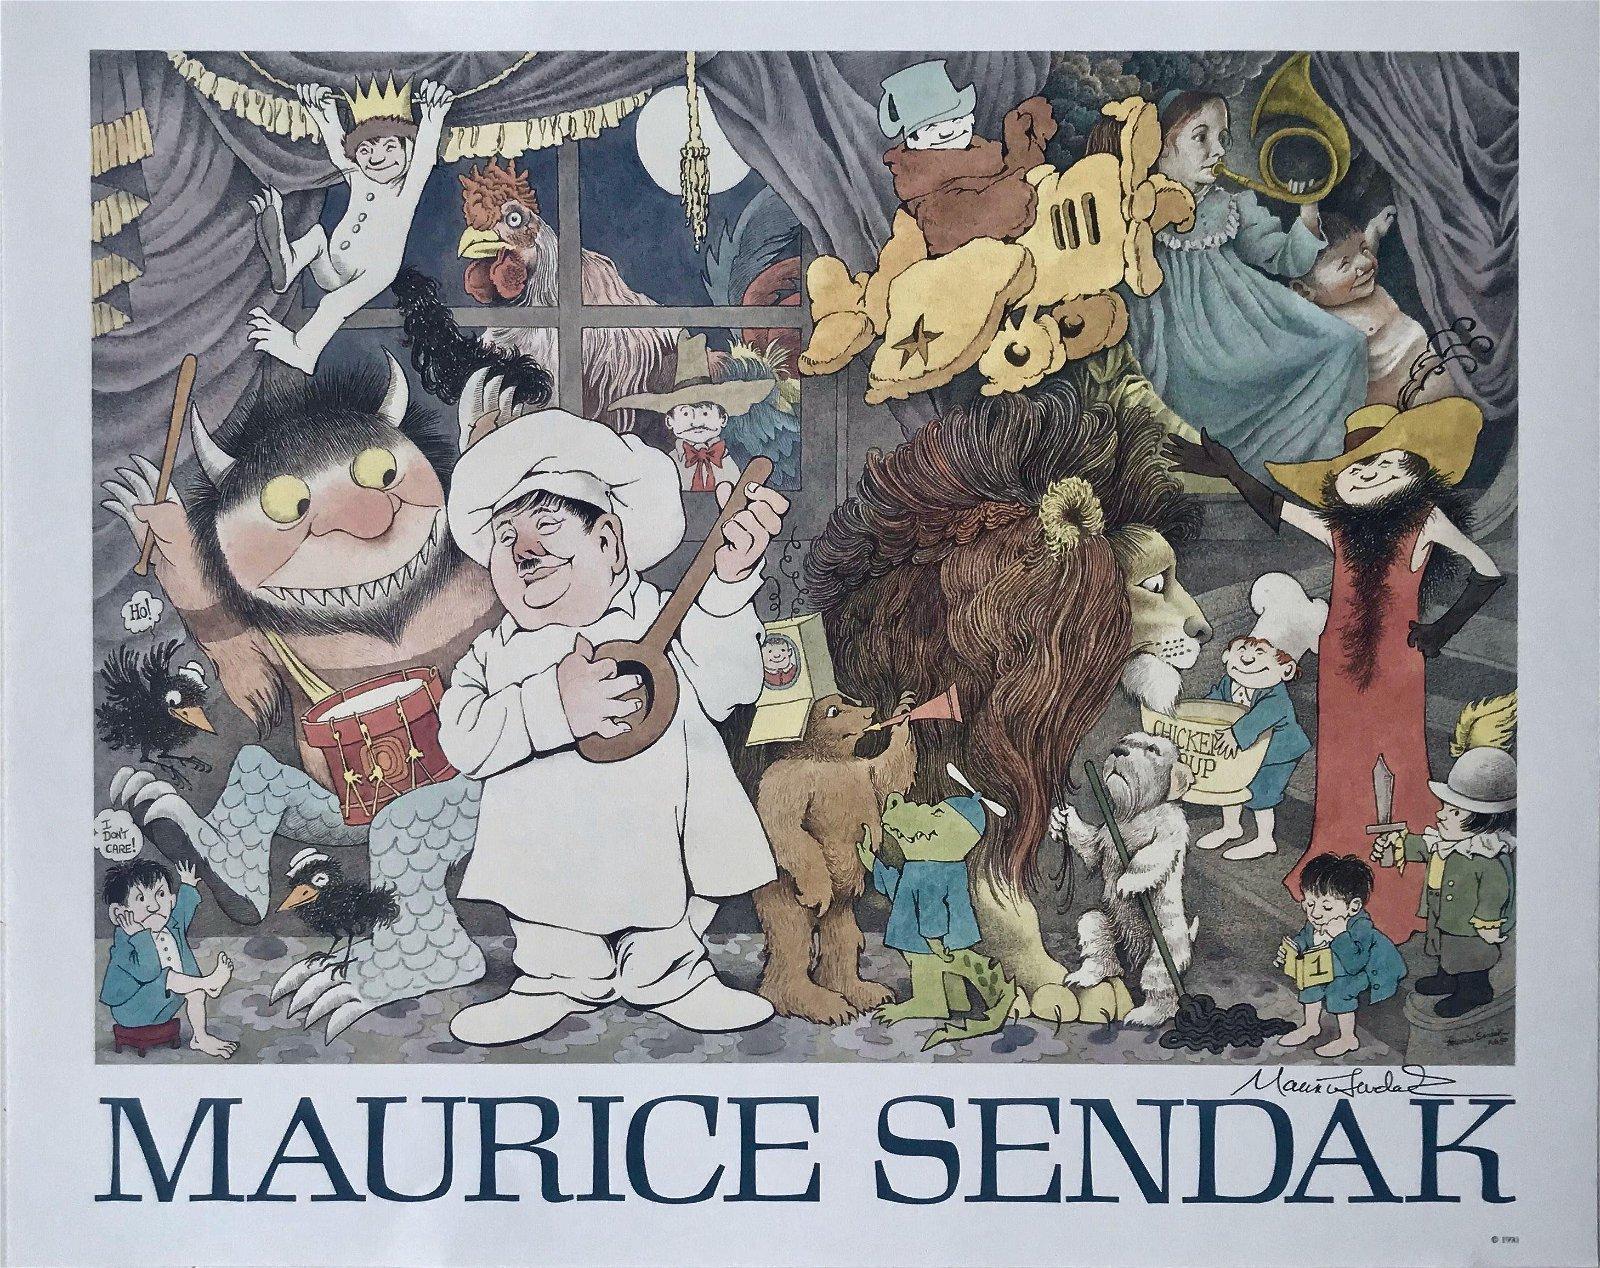 Maurice Hand-Signed MAURICE SENDAK Poster, 1990